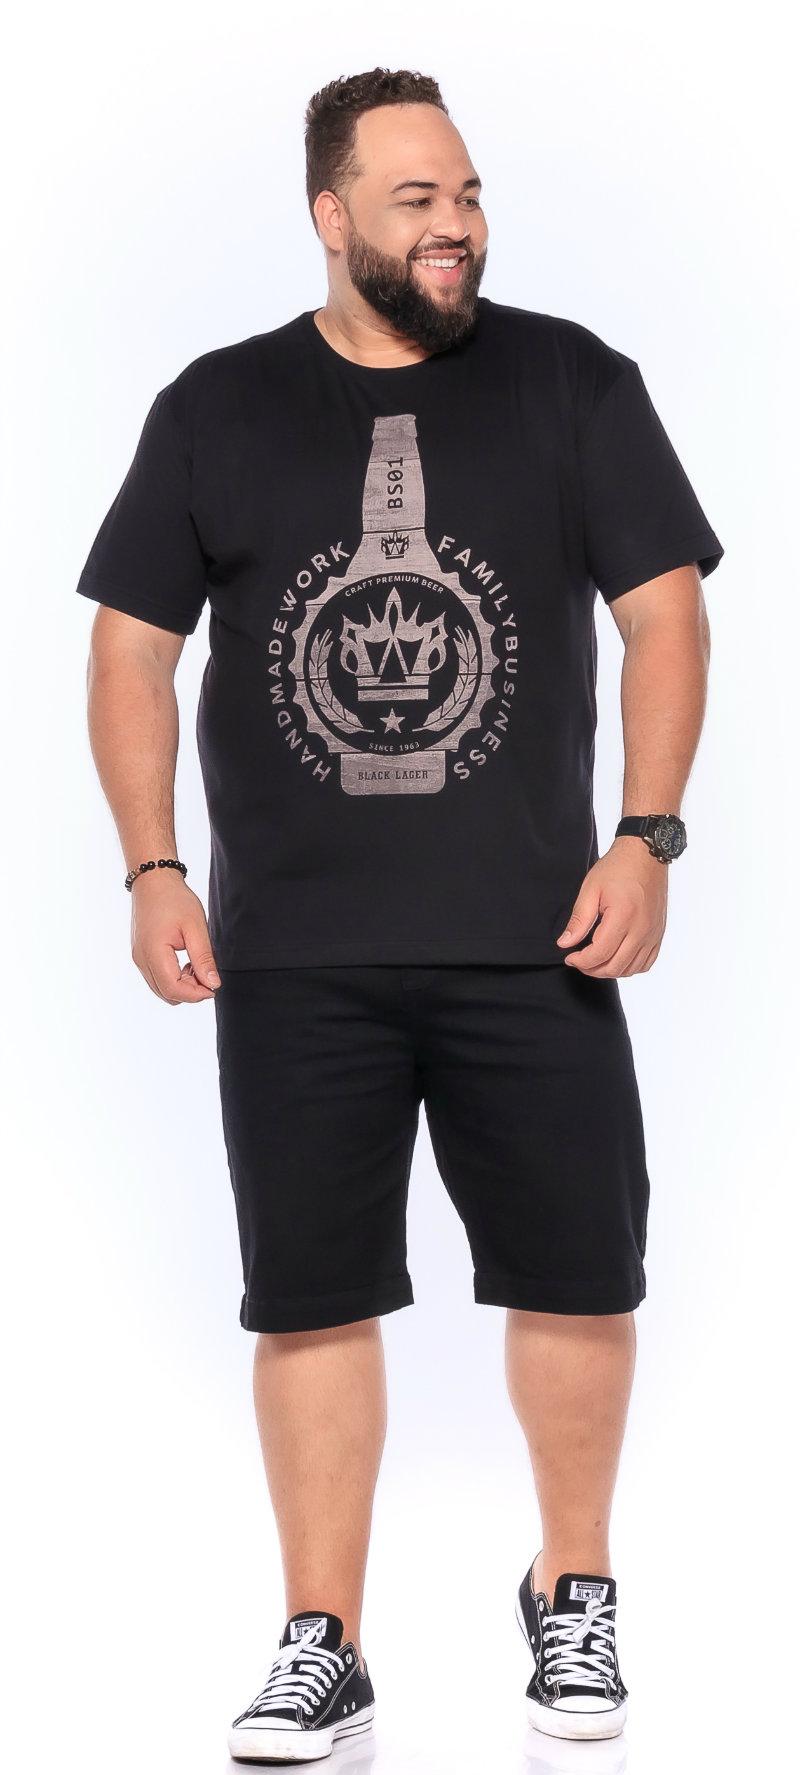 Camiseta plus size New Beer Preta